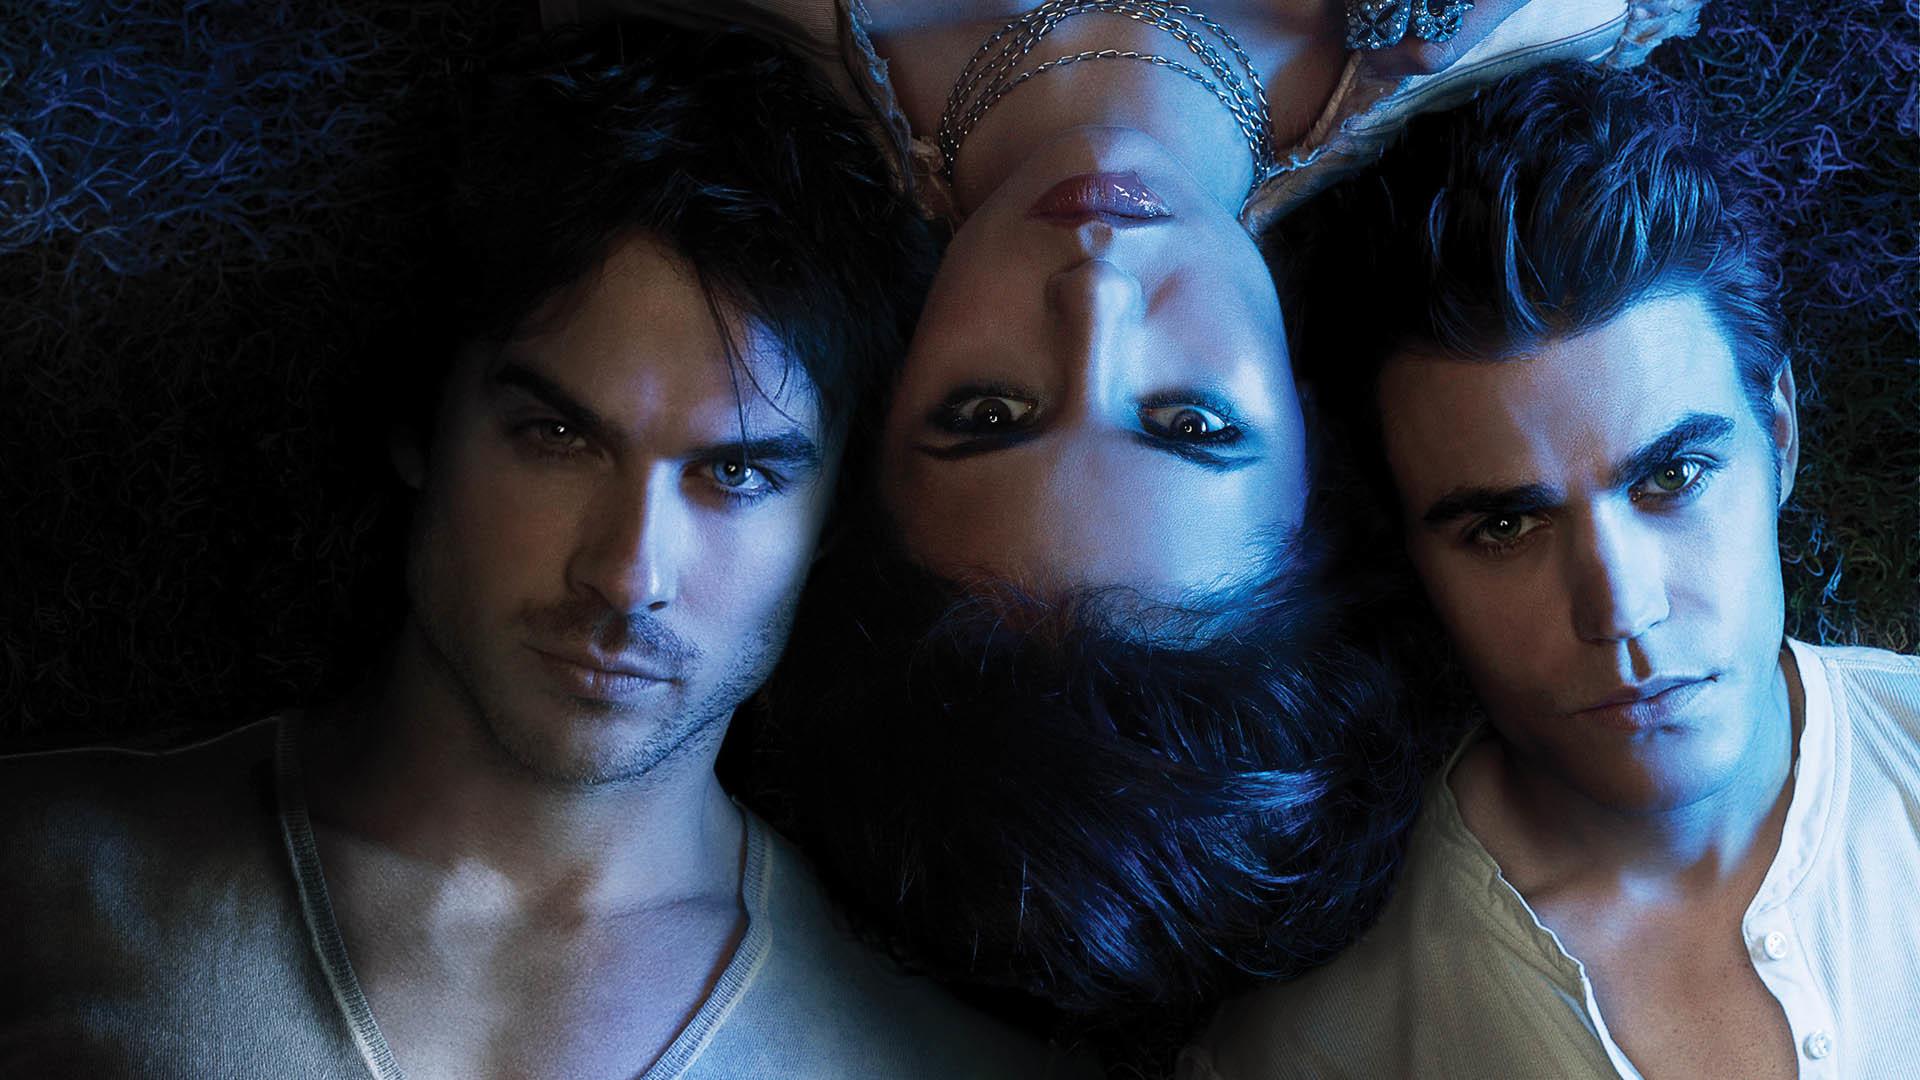 1920x1080 The Vampire Diaries HD Wallpaper. Download · 1920x1080